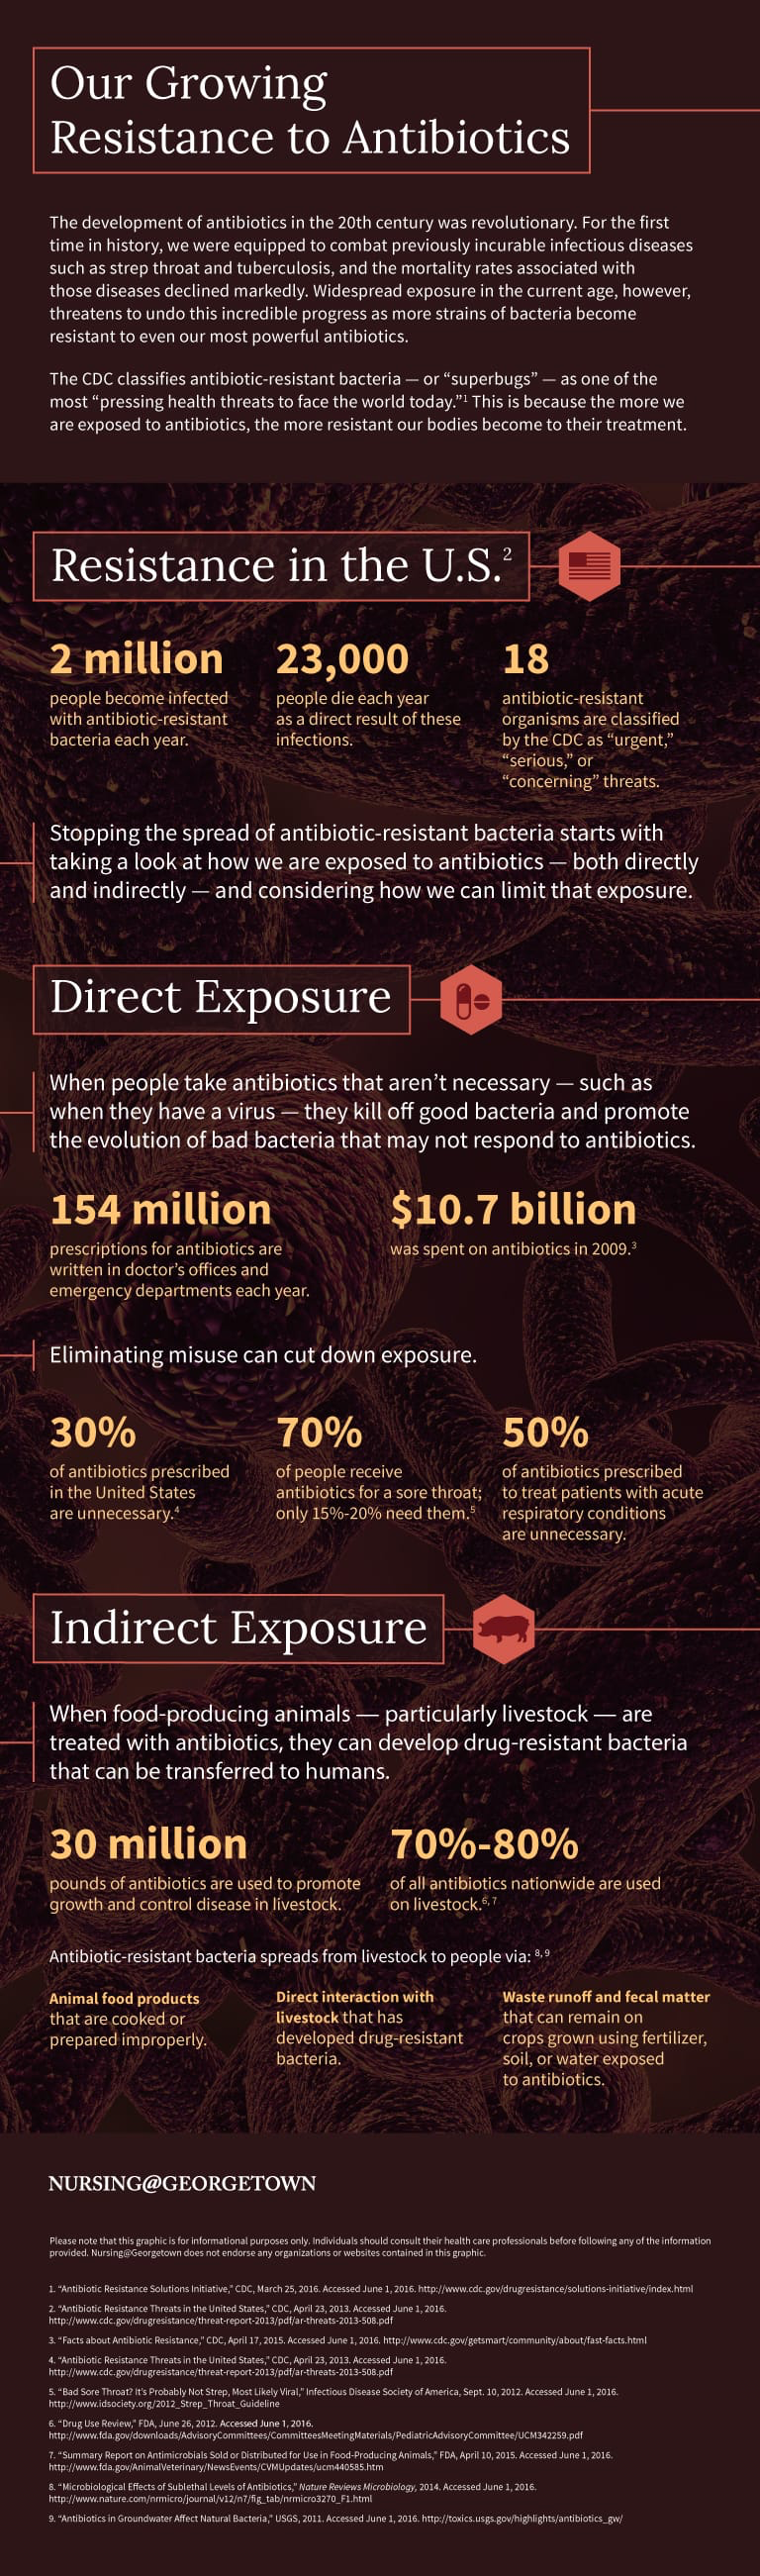 GU_antibiotic_resistance_infographic (1)